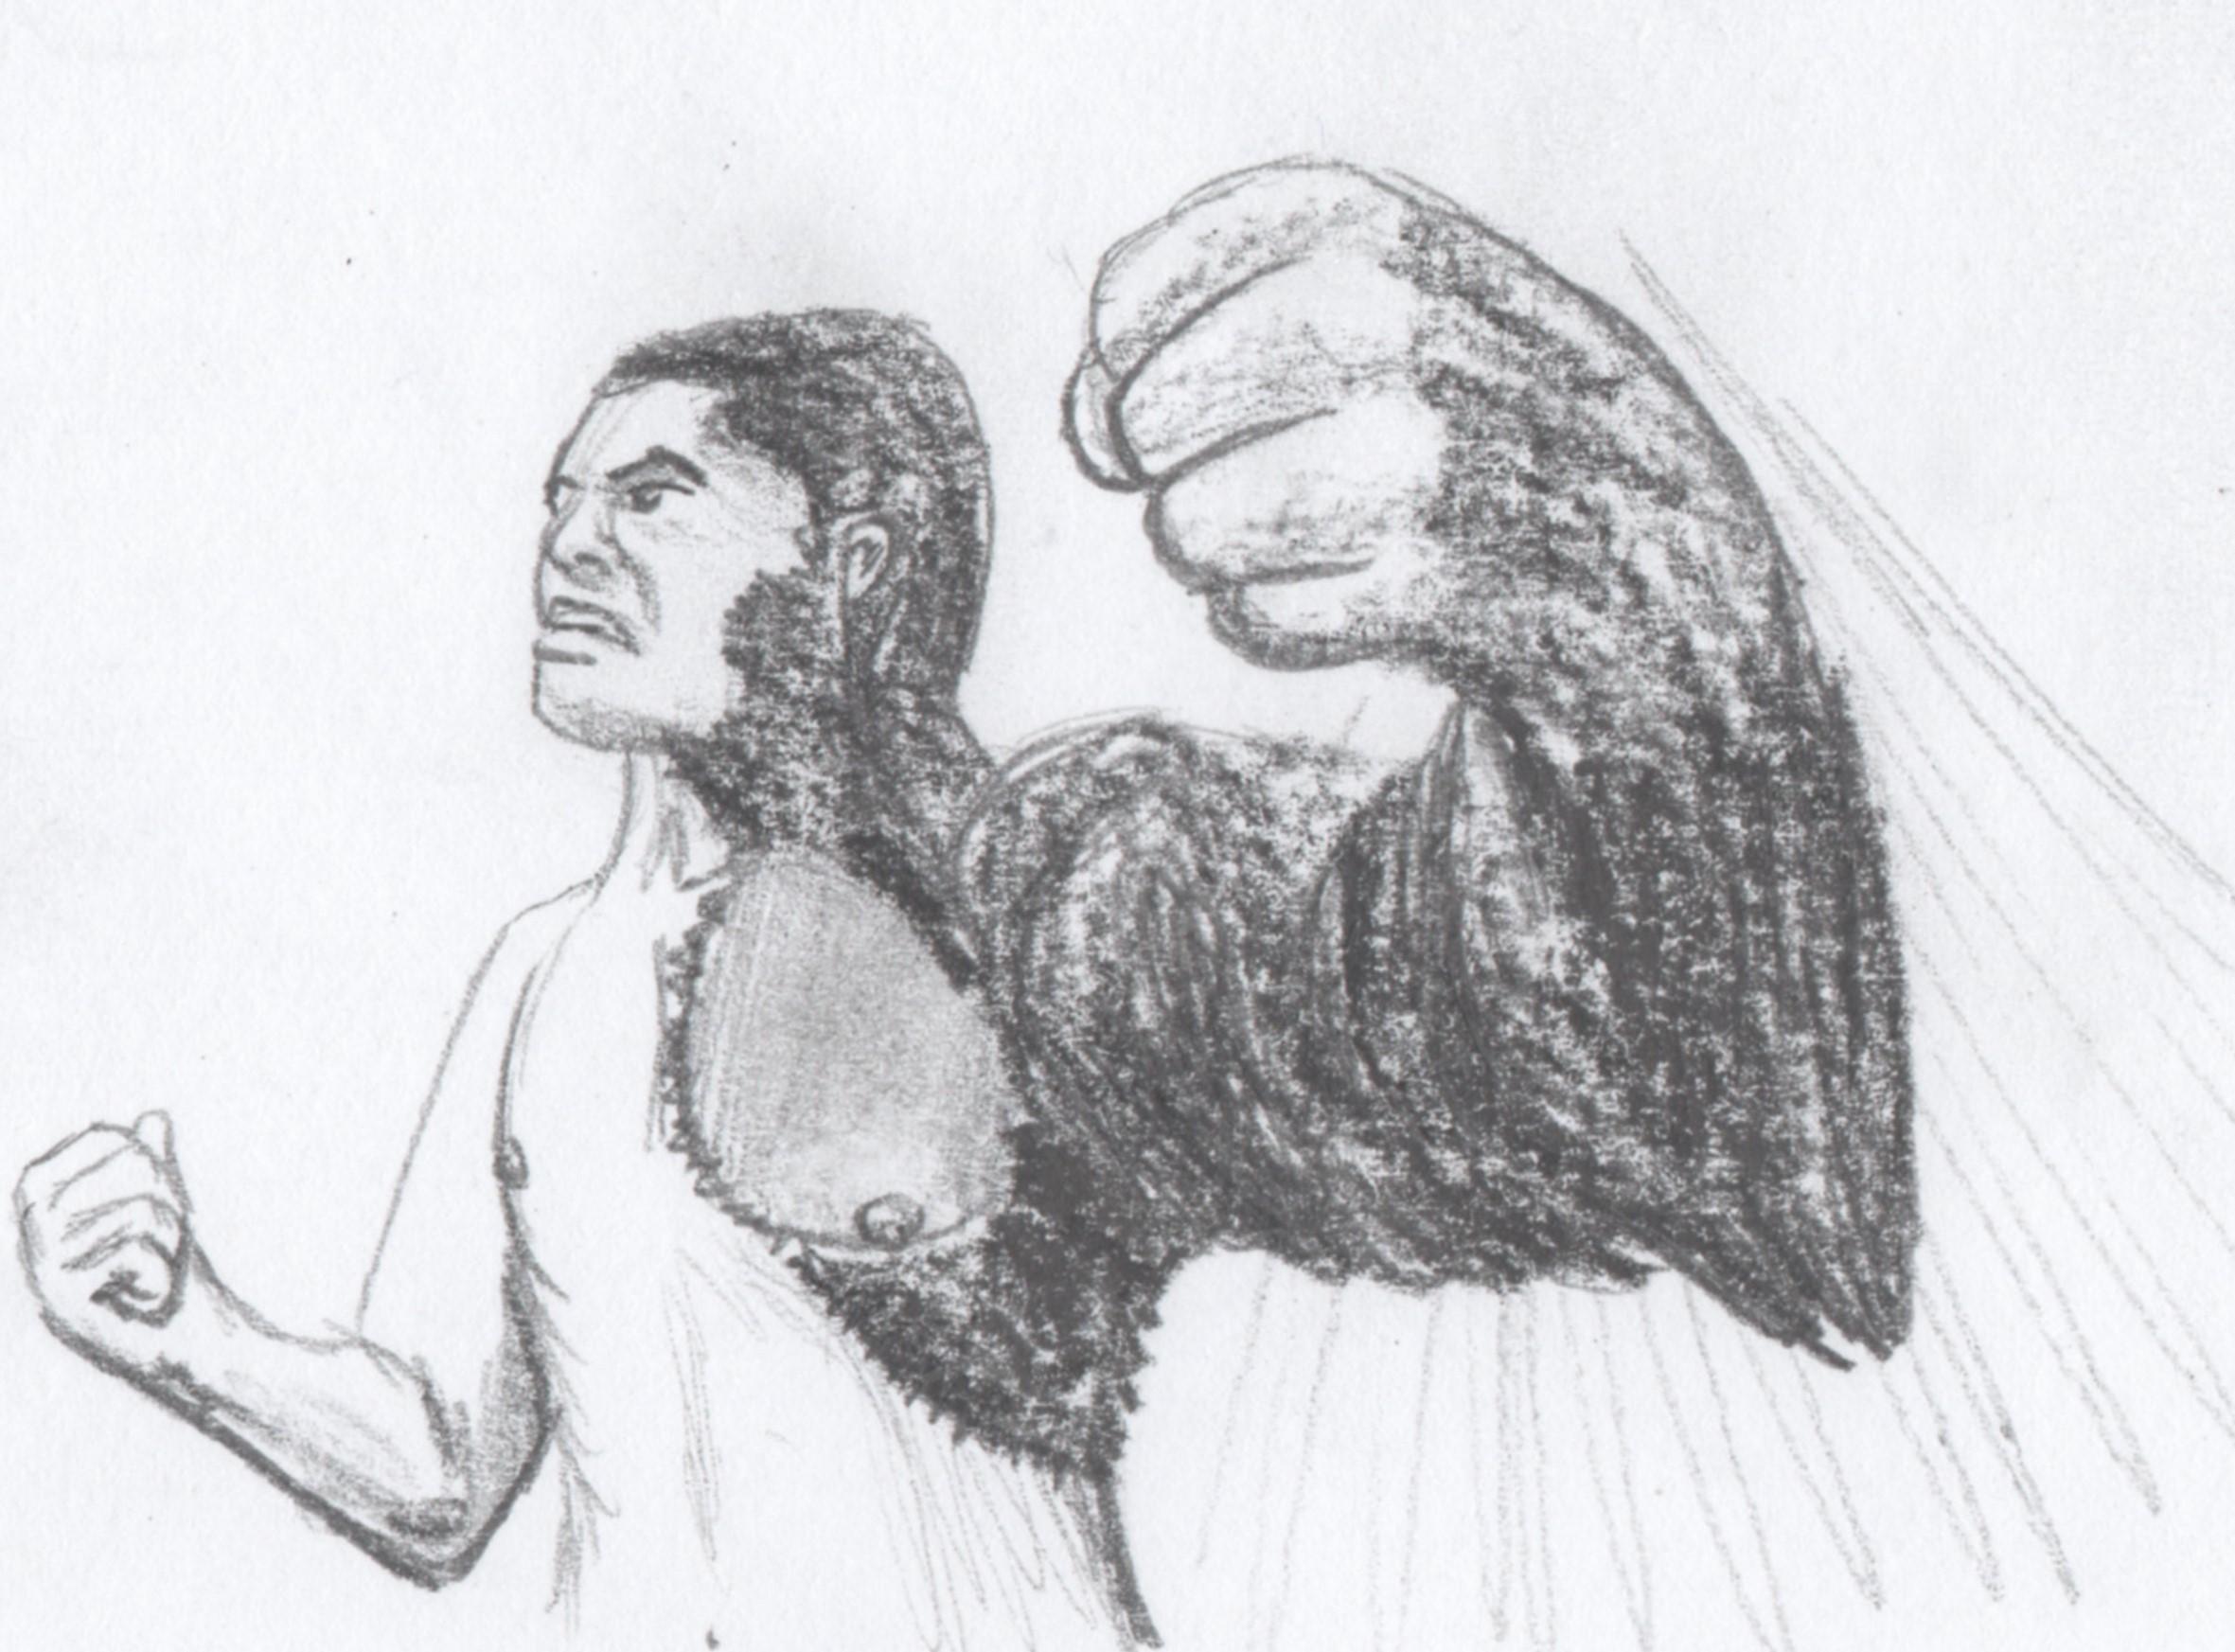 Drawn wolfman buff body Guy hairy half covering :